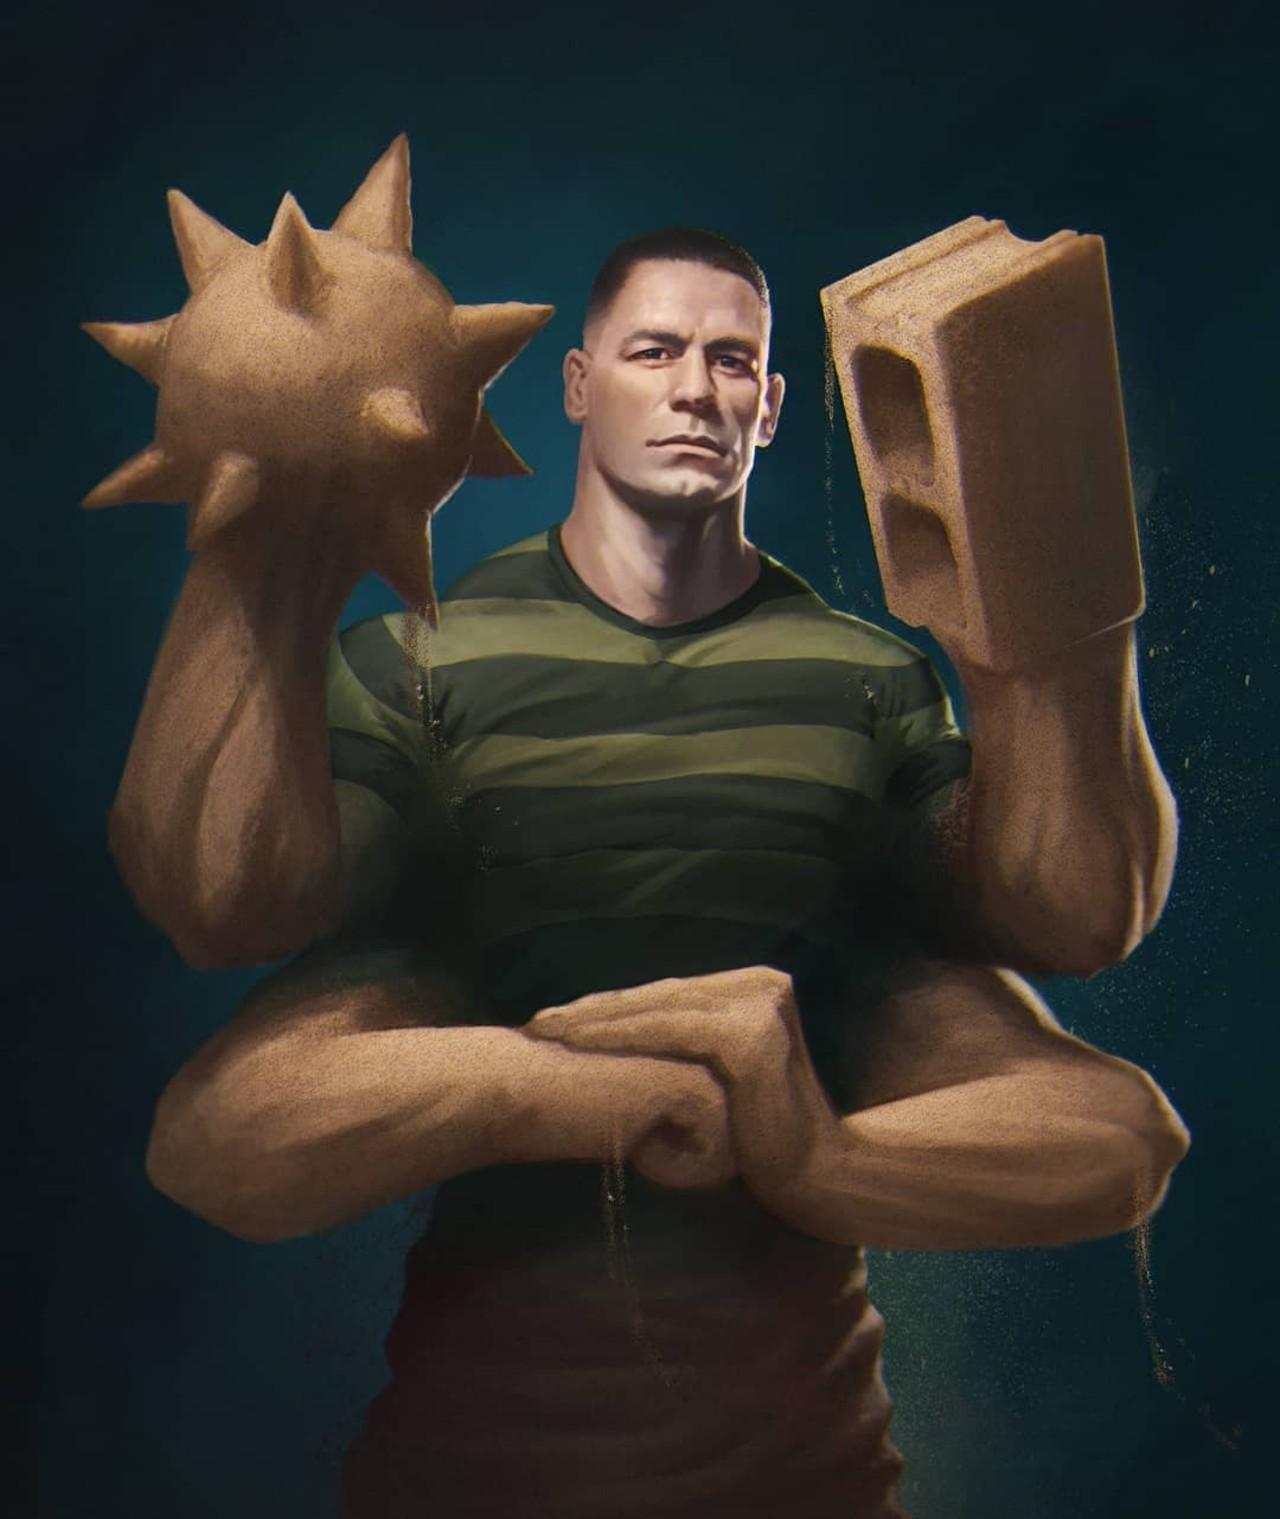 John Cena sandman spiderman peliculas